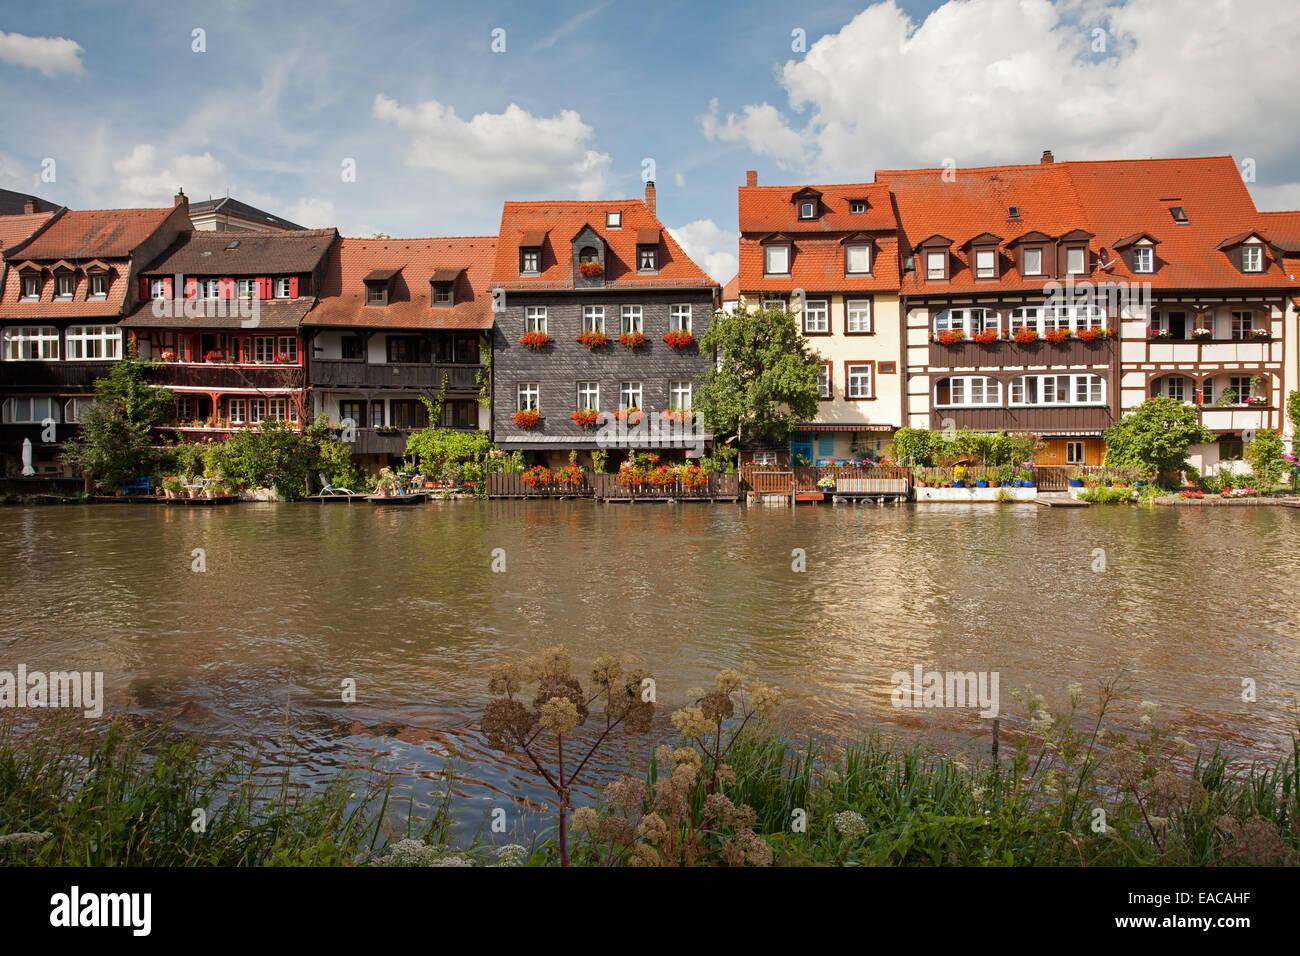 Bamberg: Klein-Venedig - Stock Image